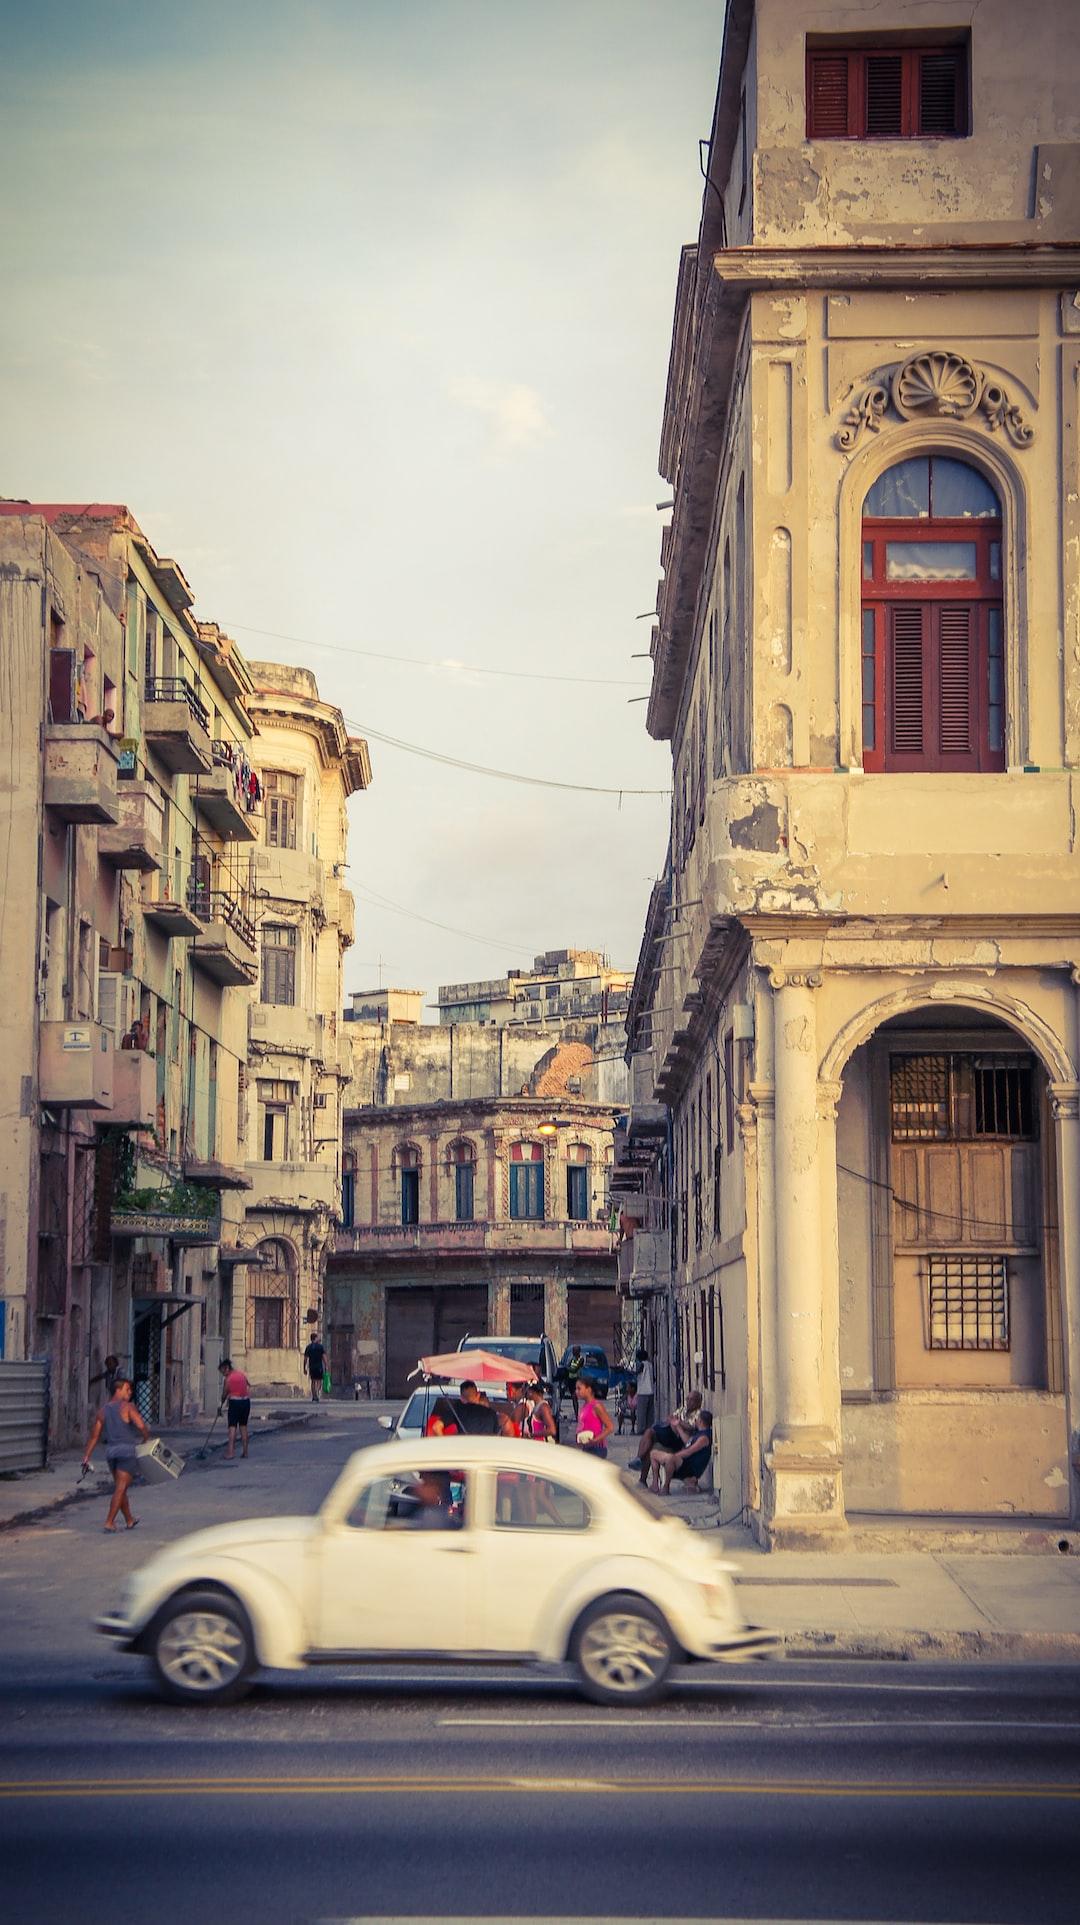 On the road - La havana / Cuba